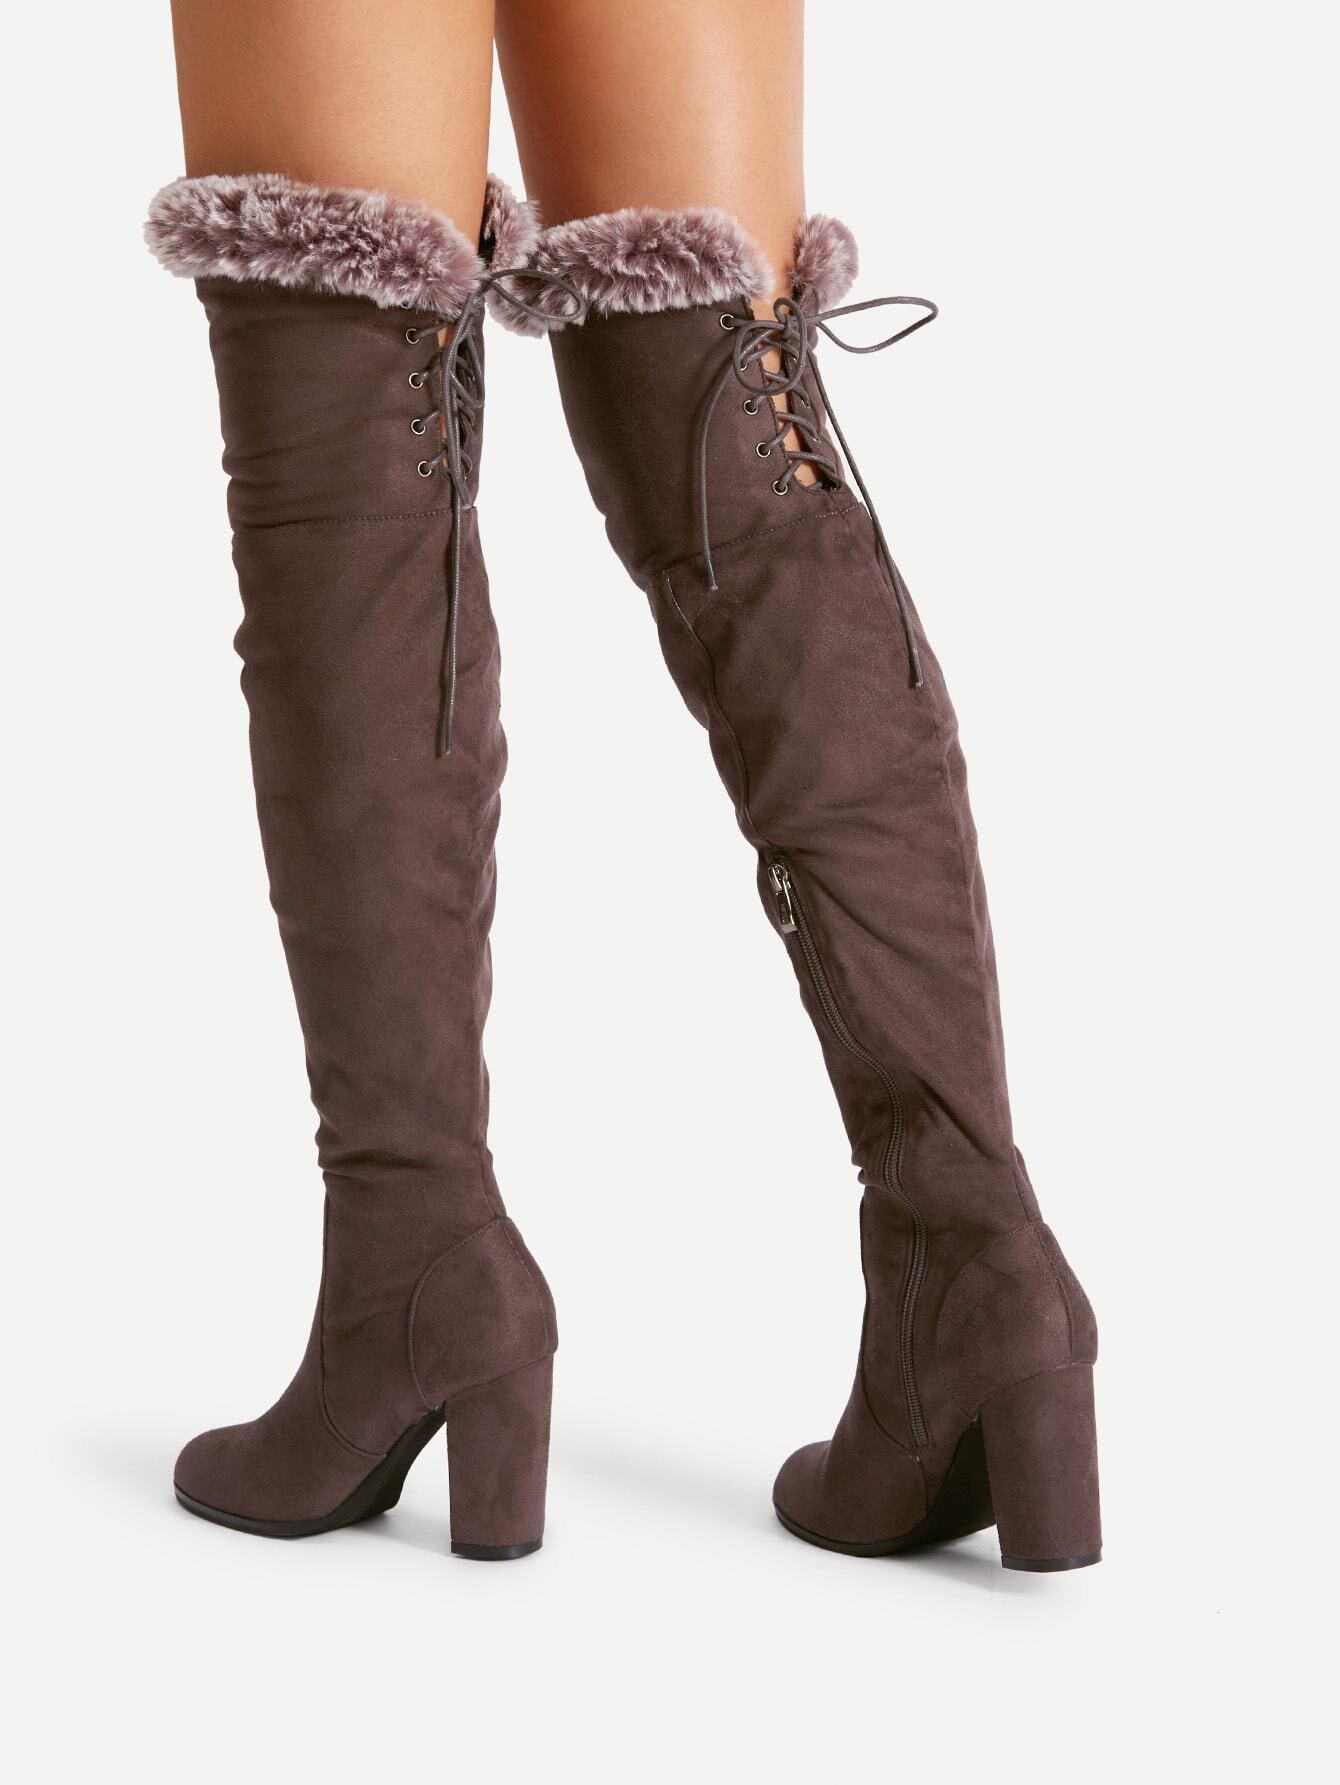 Faux Fur Trim Lace Up Suede Boots manitobah перчатки suede mitt with fur trim lg charcoal св серый